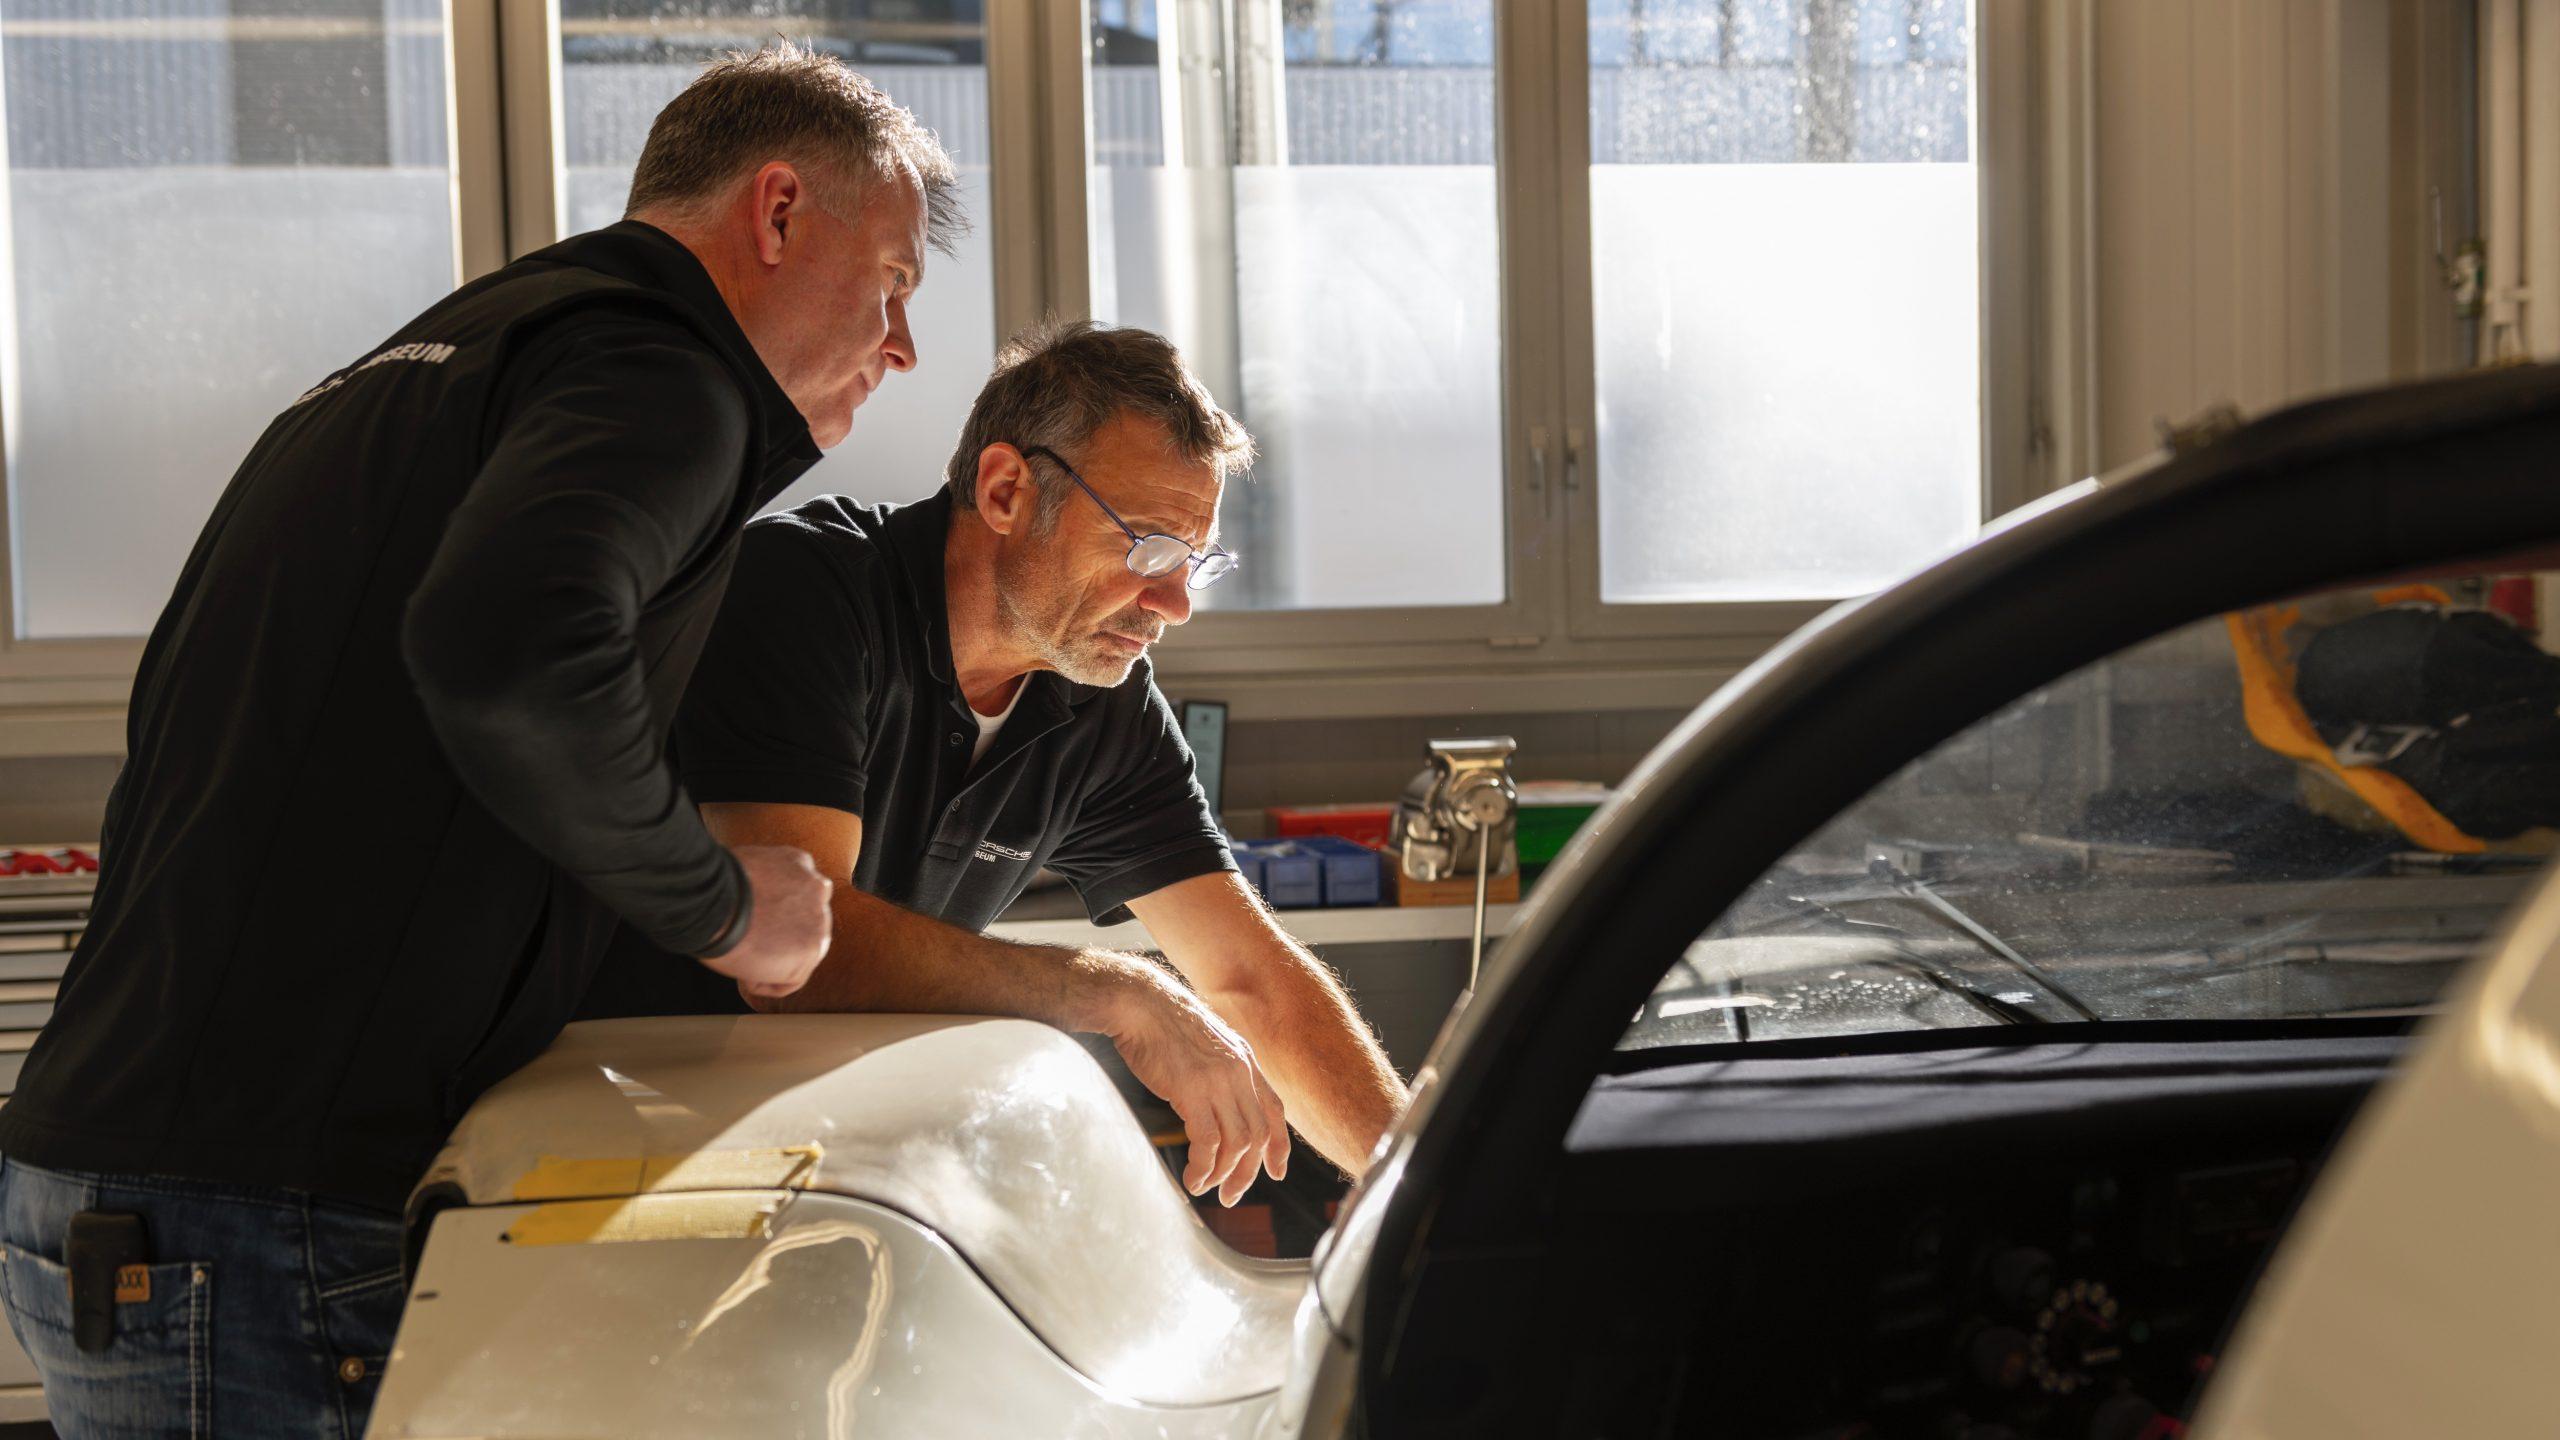 Porsche 962 C restoration process Armin Burger and Berthold Brecht